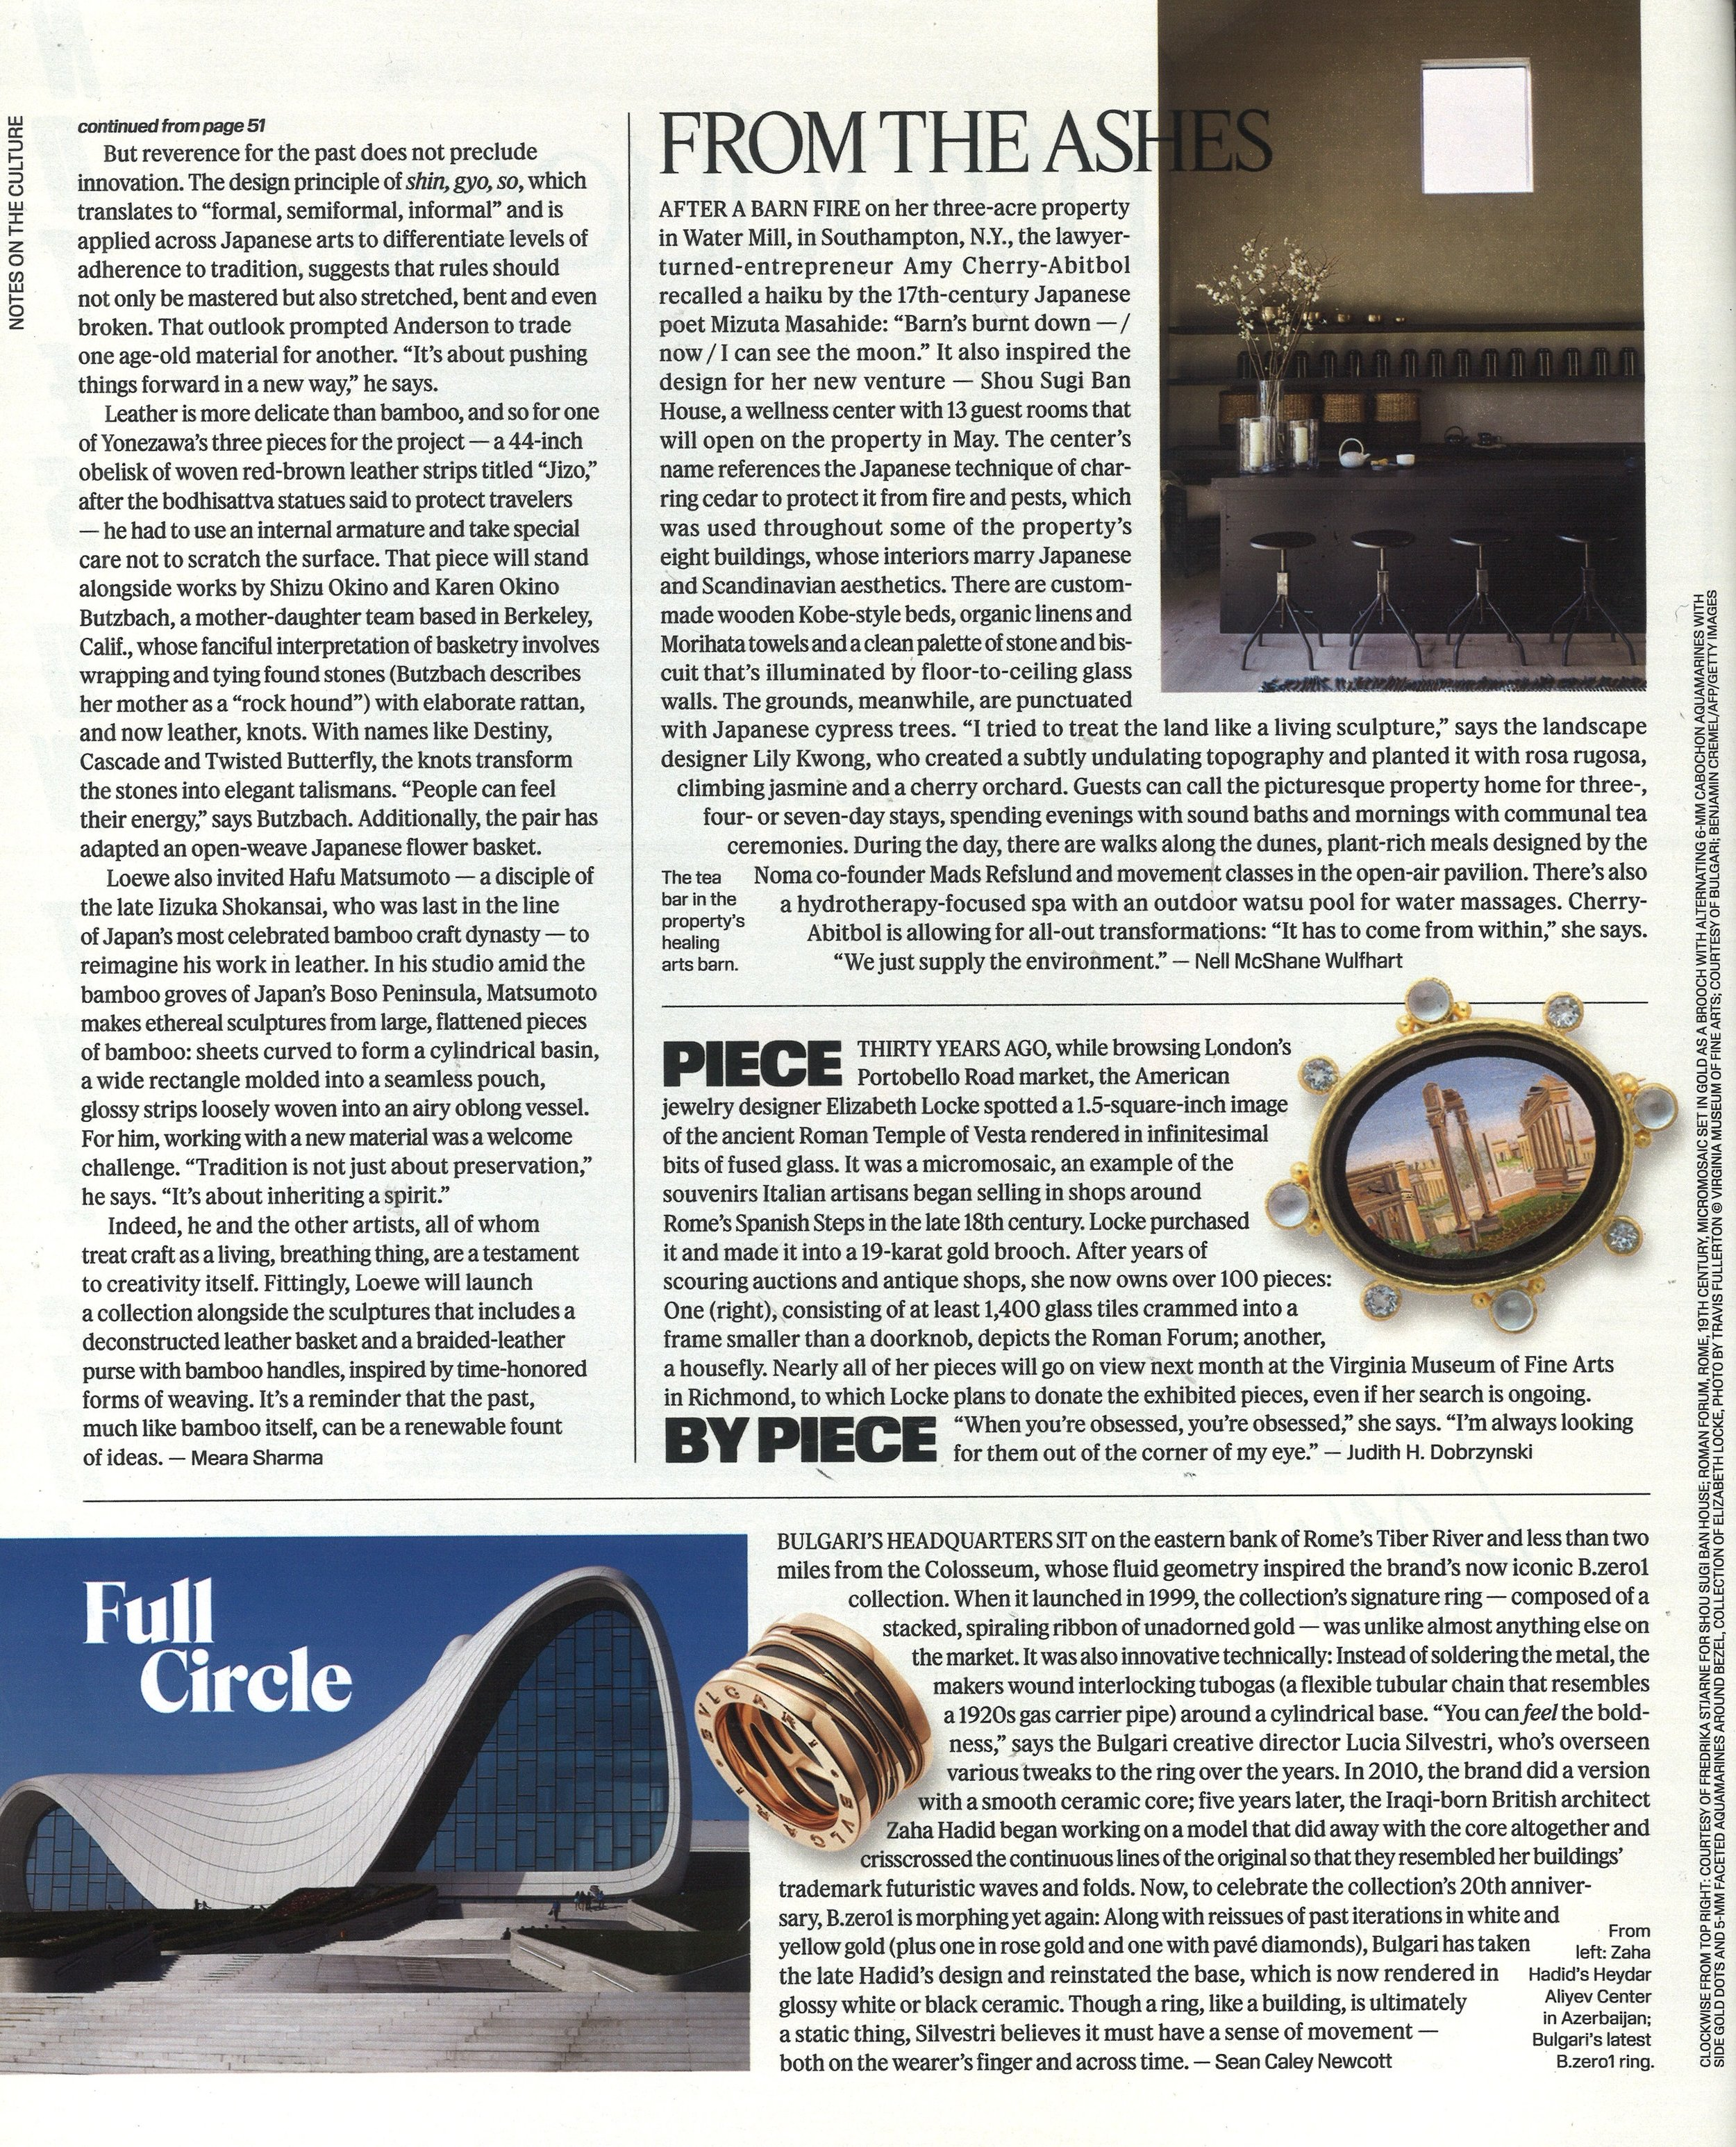 EL_TTheNewYorkTimesStyleMagazine_3.24.19.jpg